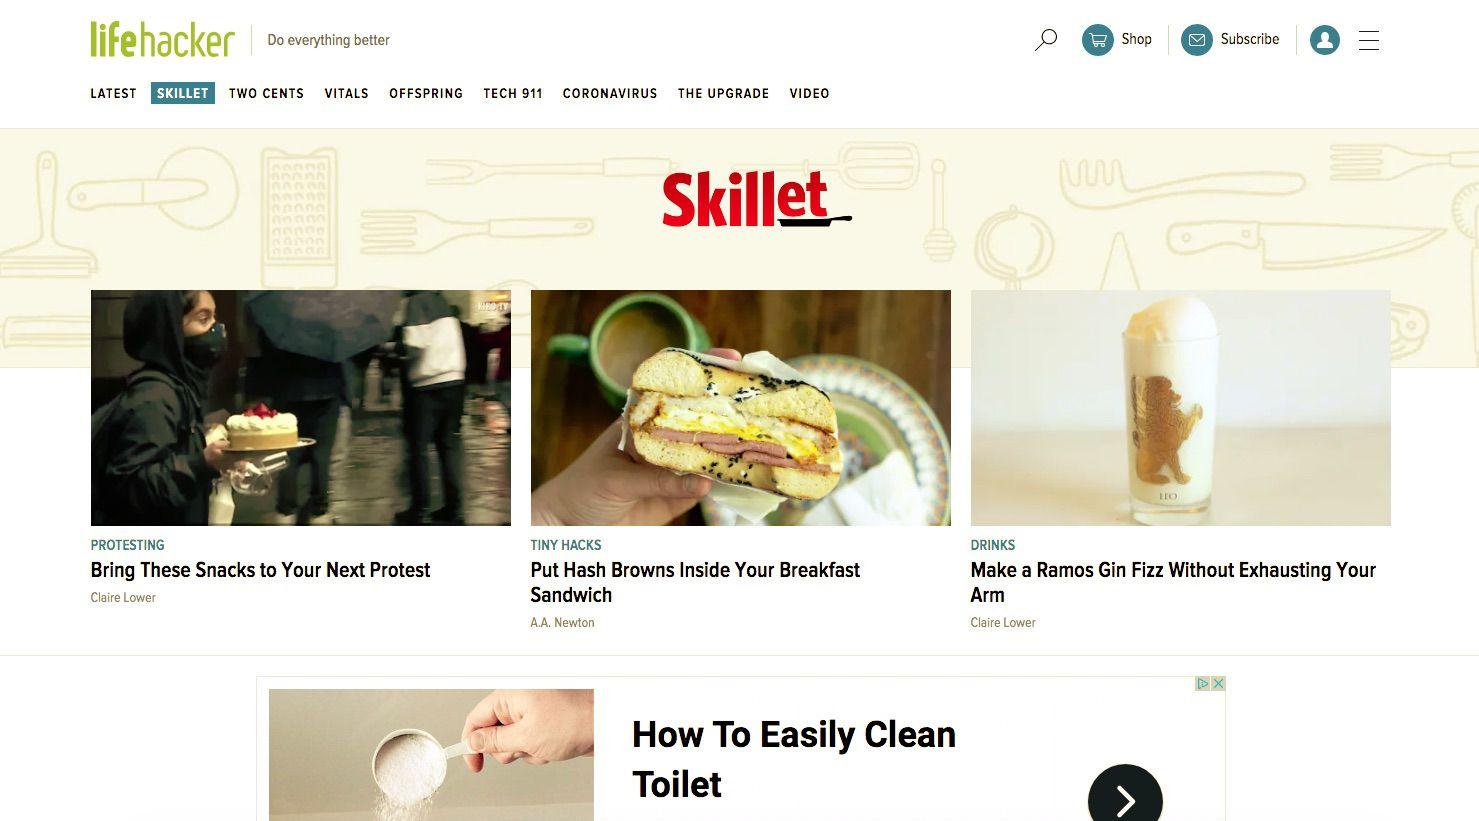 Lifehacker Skillet page